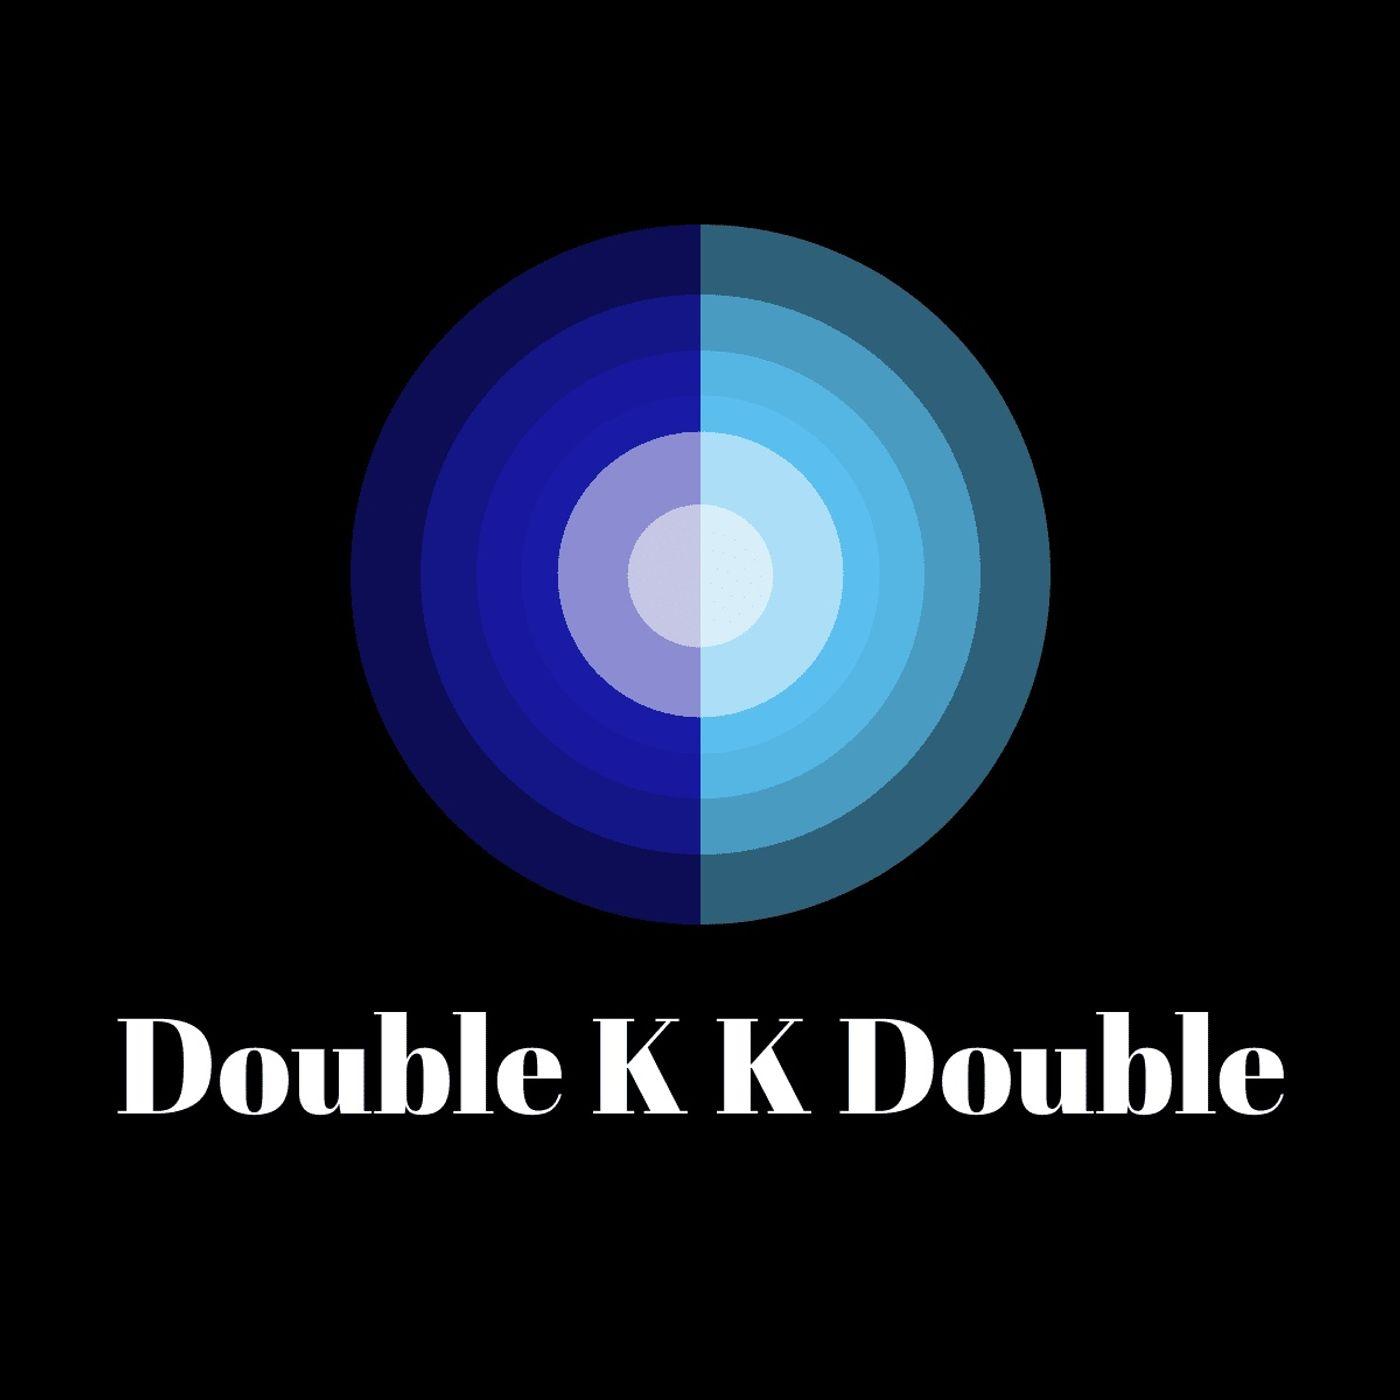 Double K K Double Network